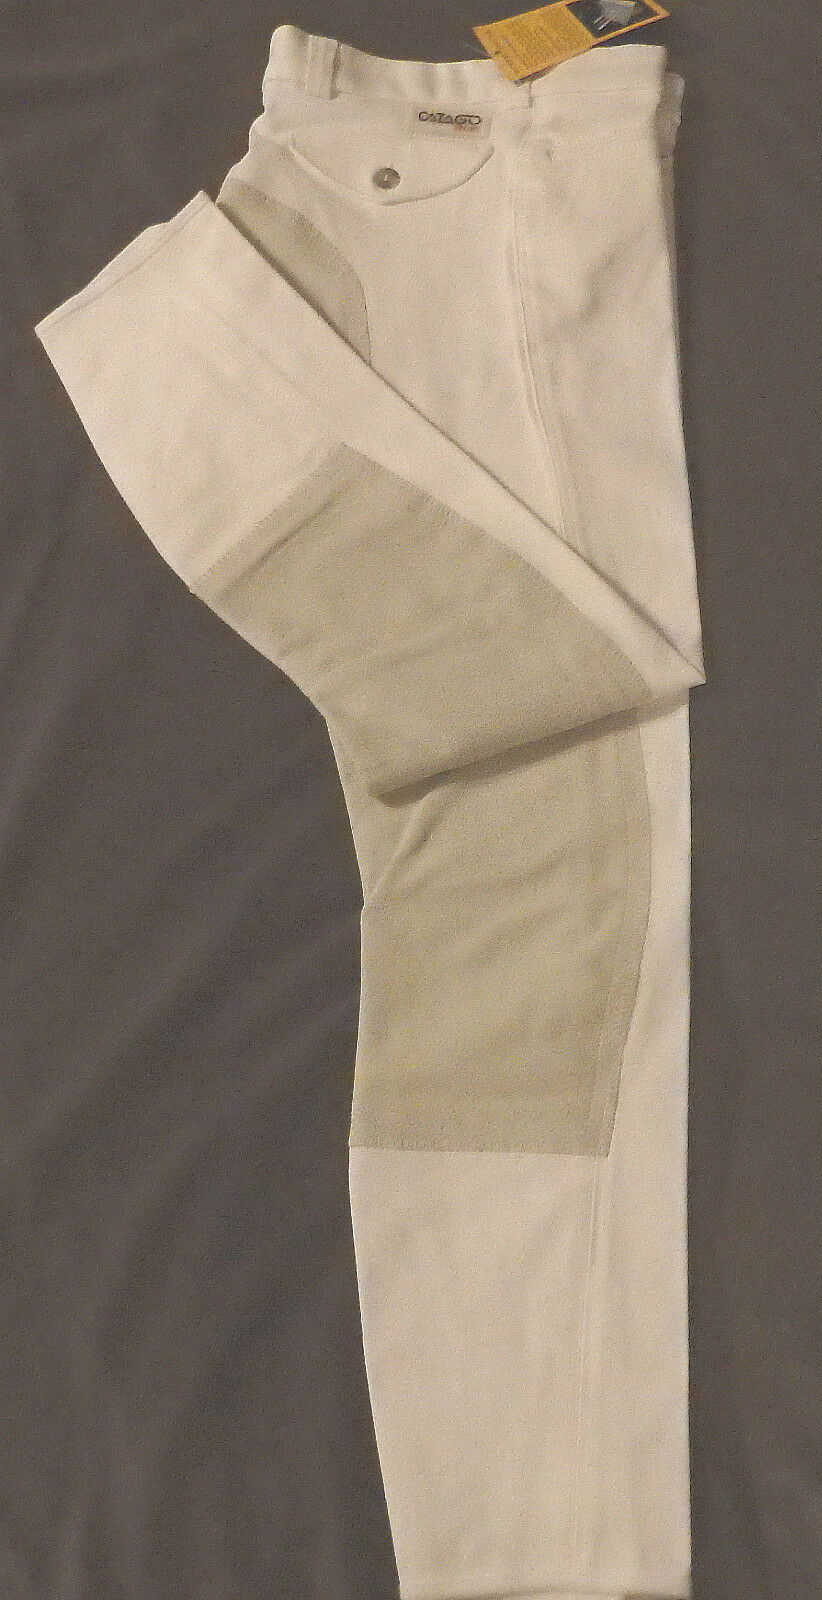 CATAGO Ladies Breeches, 3 4 Full Trim, White,  Size 36, Trim Light Grey, (1224)  sale online